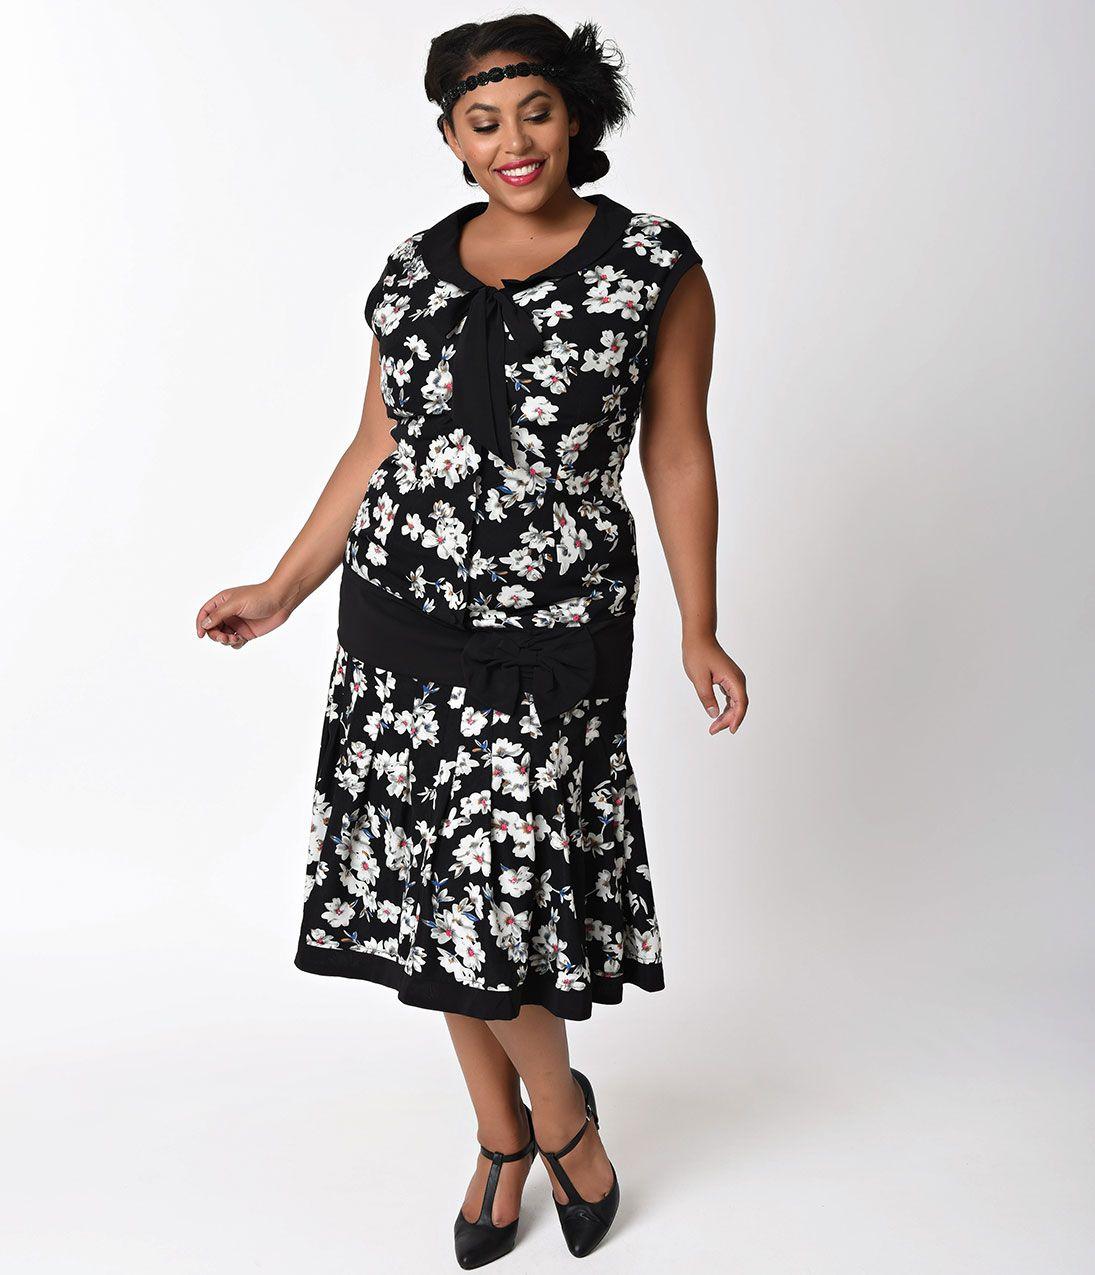 26263927ed5 Plus Size 1920s 1930s Black Ivory Flapper Day Fashion Dress  110.00 AT  vintagedancer.com